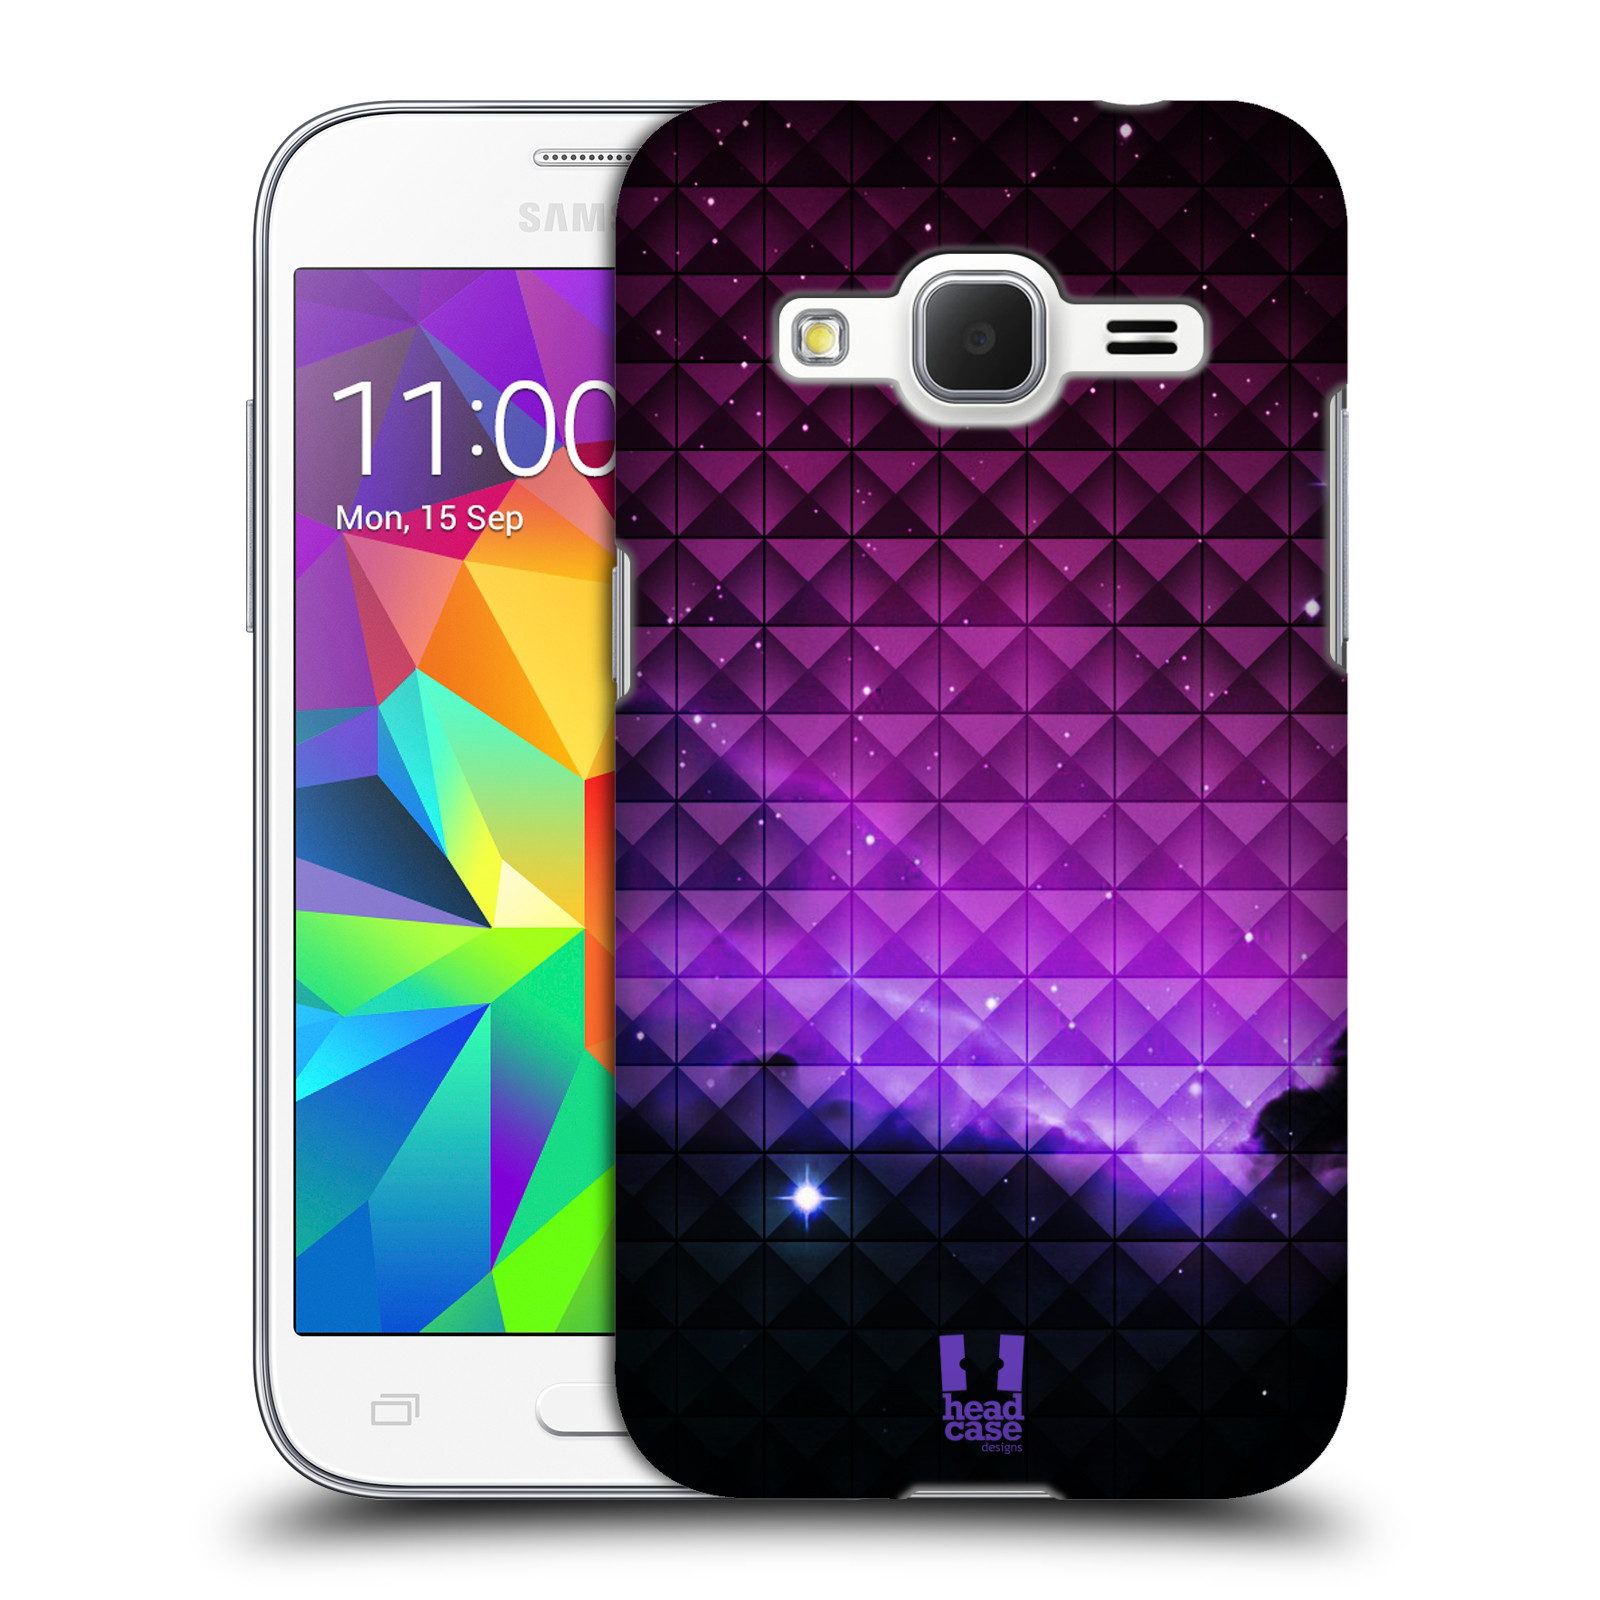 Plastové pouzdro na mobil Samsung Galaxy Core Prime VE HEAD CASE PURPLE HAZE (Kryt či obal na mobilní telefon Samsung Galaxy Core Prime LTE VE SM-G361F)